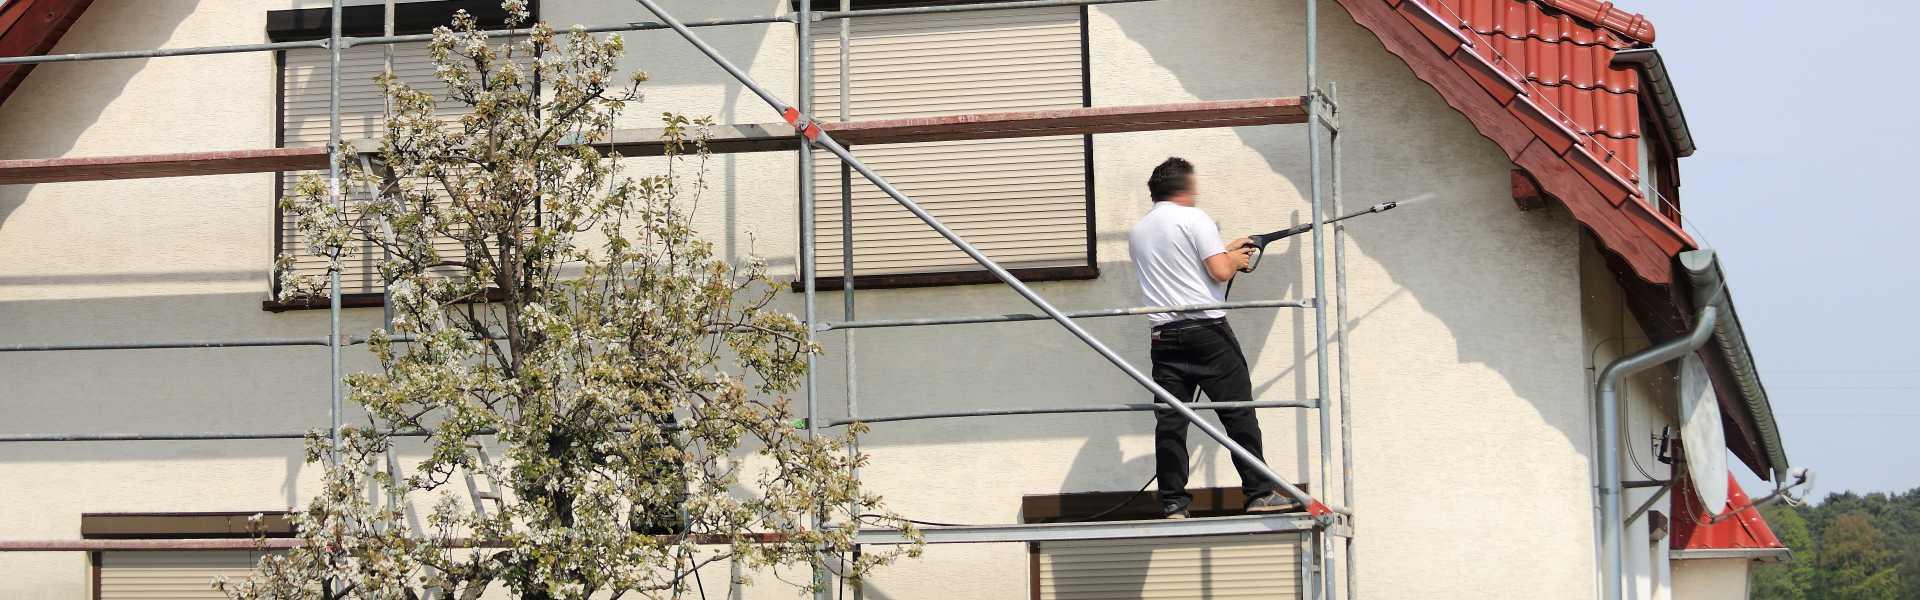 Ekologické čistenie fasád rodinného domu